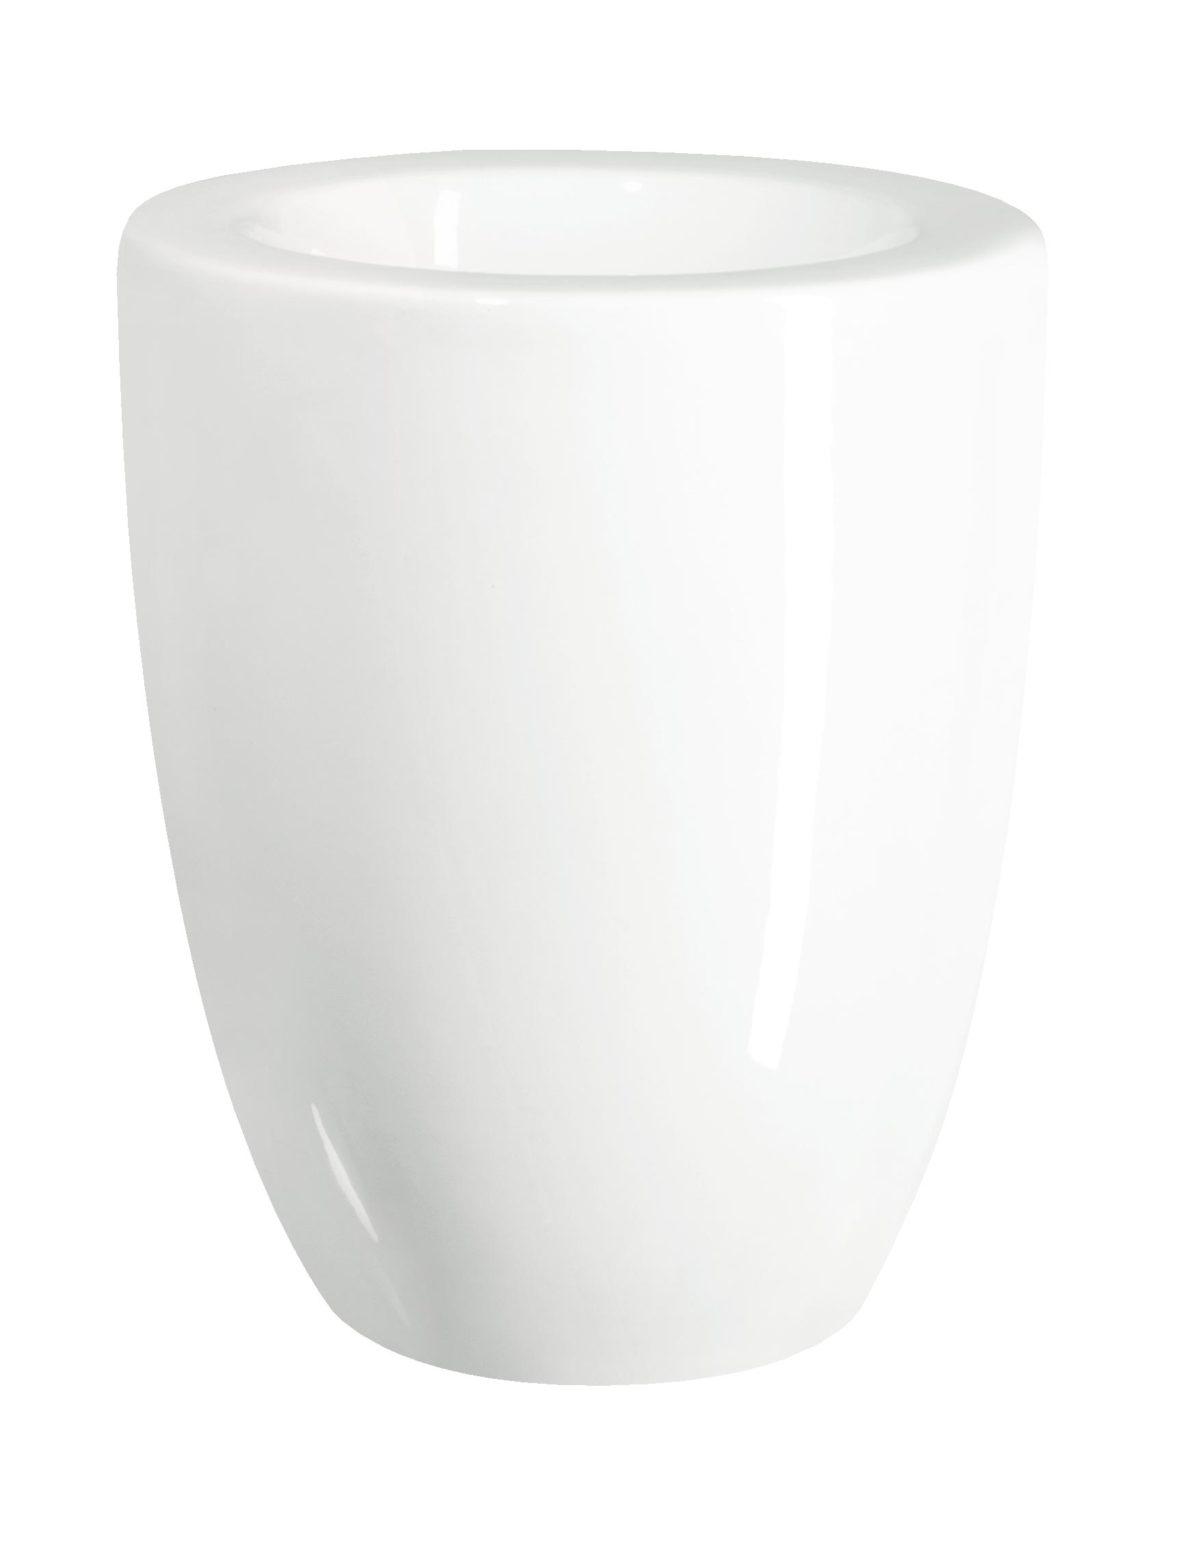 1025005 1200x1543 - Ghiveci Taste (1127005)